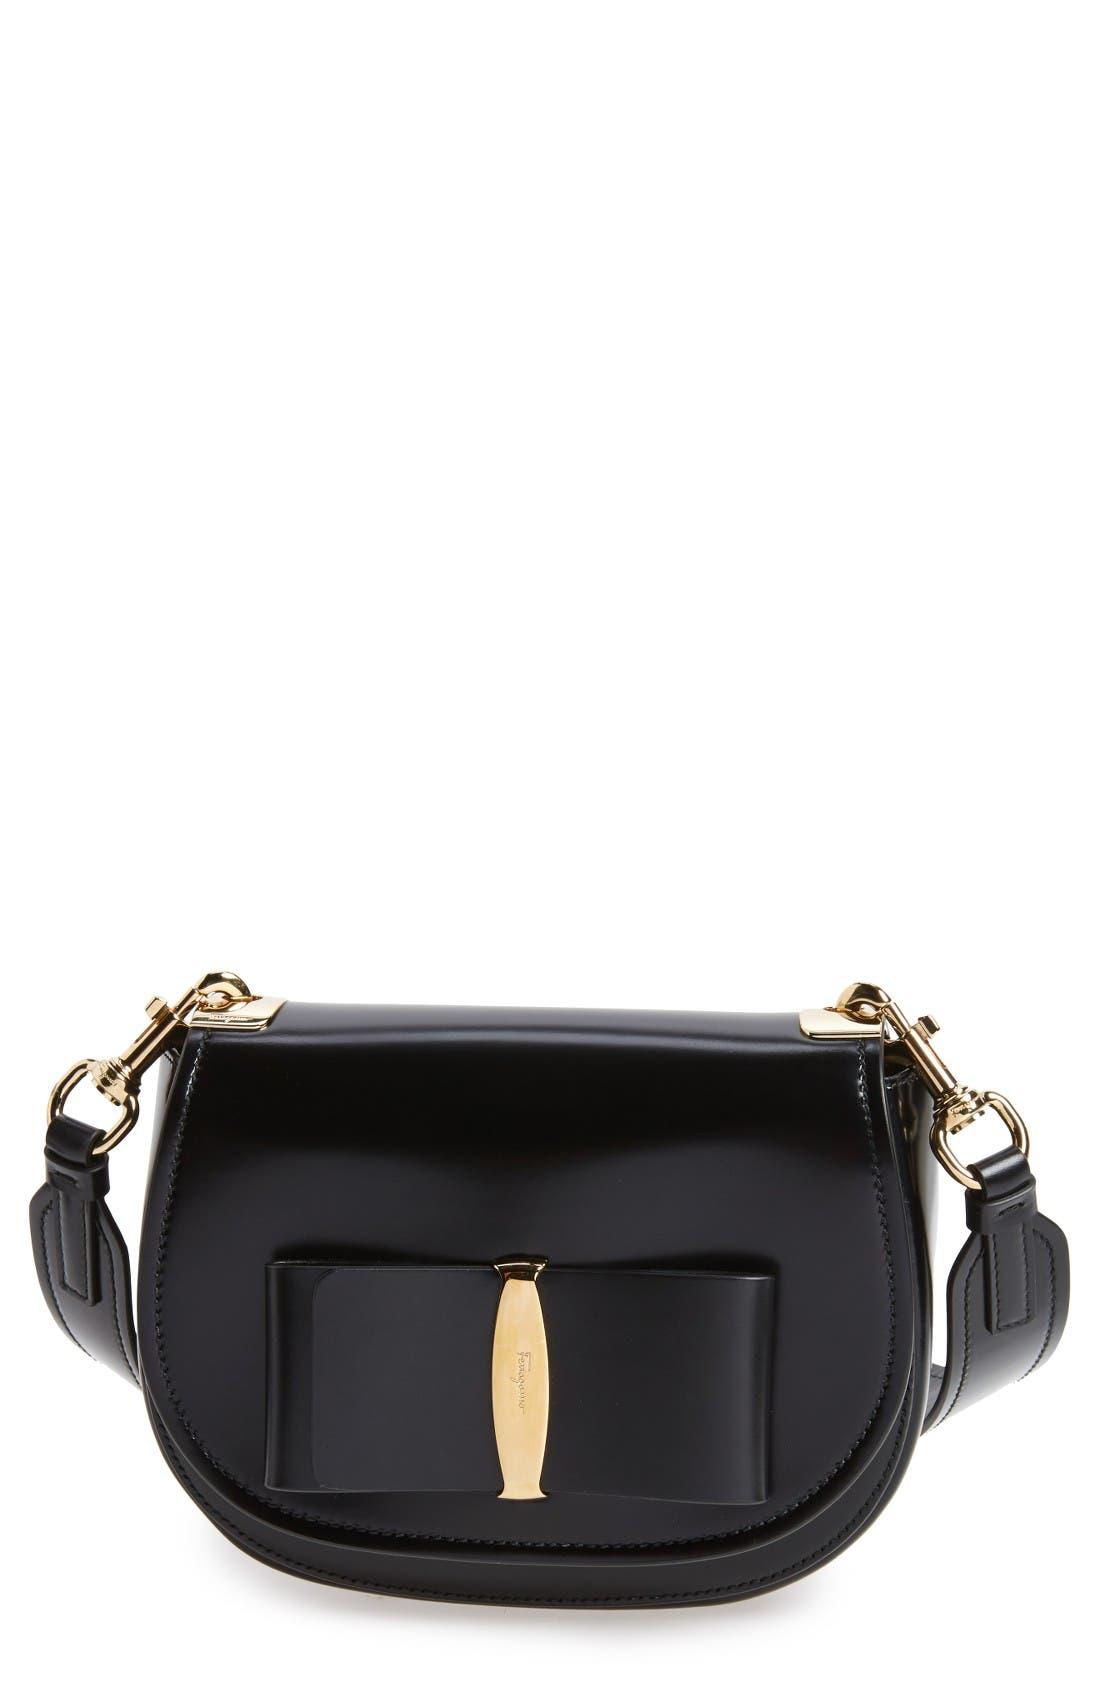 Salvatore Ferragamo Anna Vara Leather Crossbody Bag